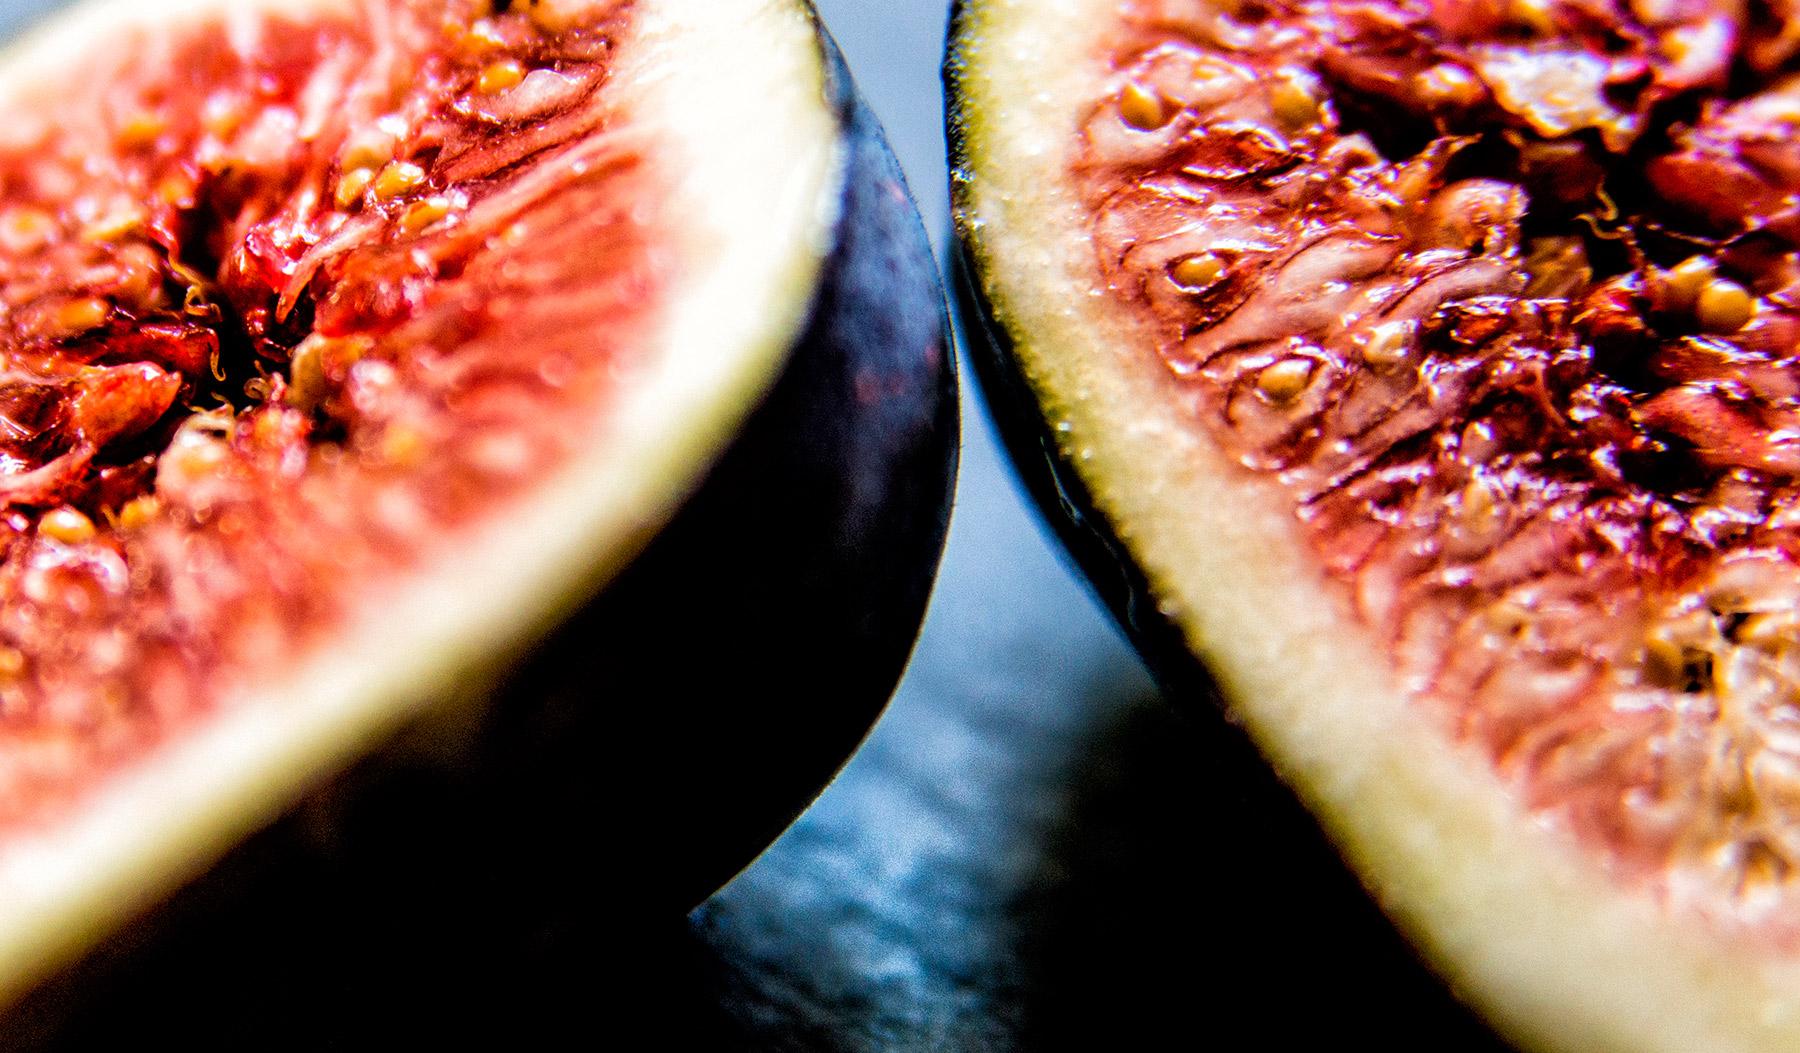 Figs-Carl Kravats-Food-Photography